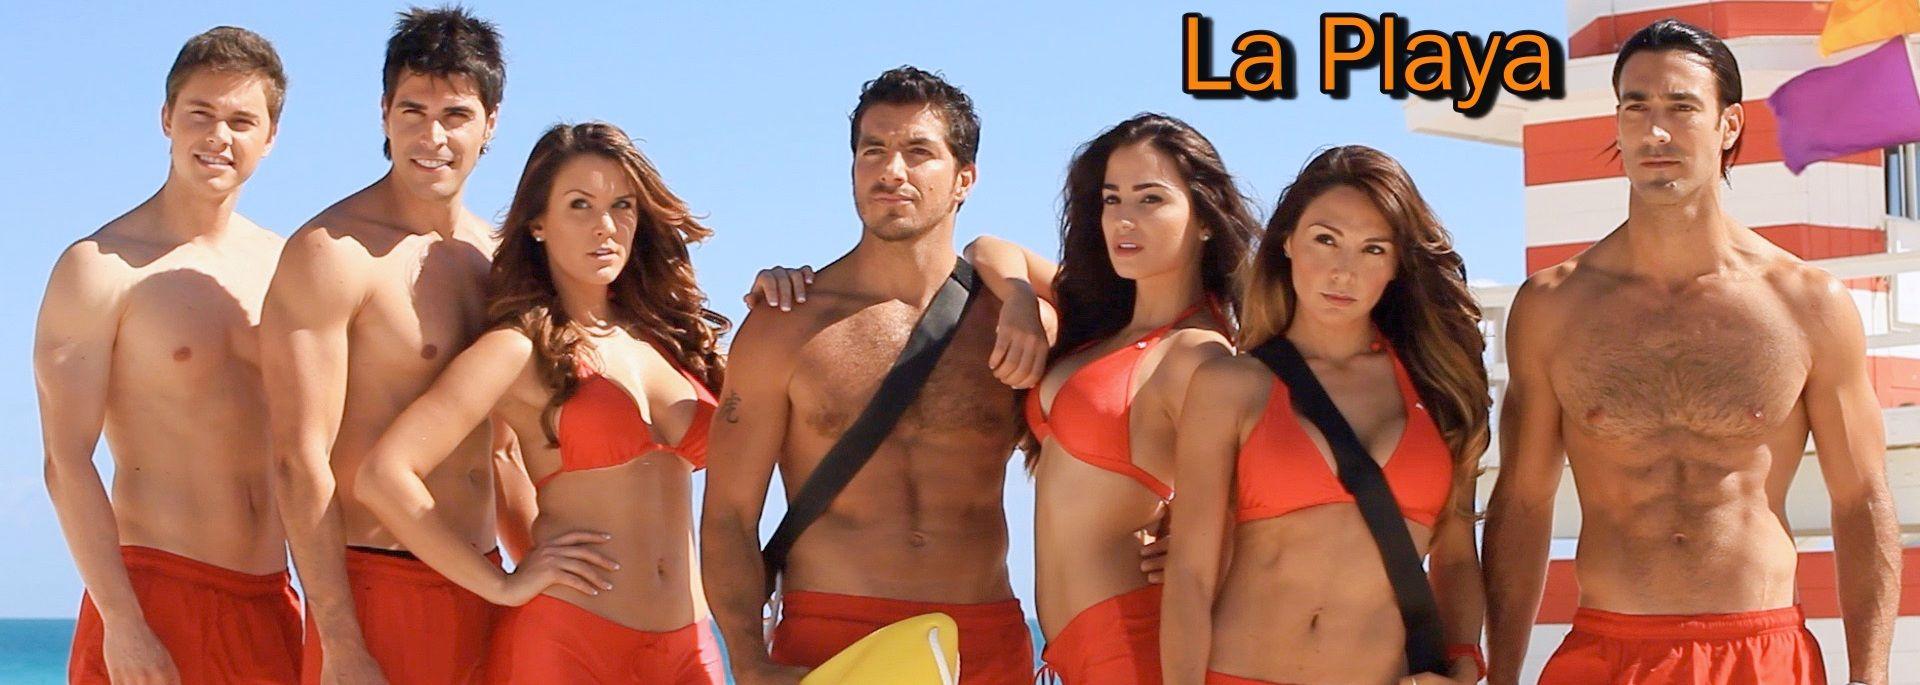 La Playa Promo Picture